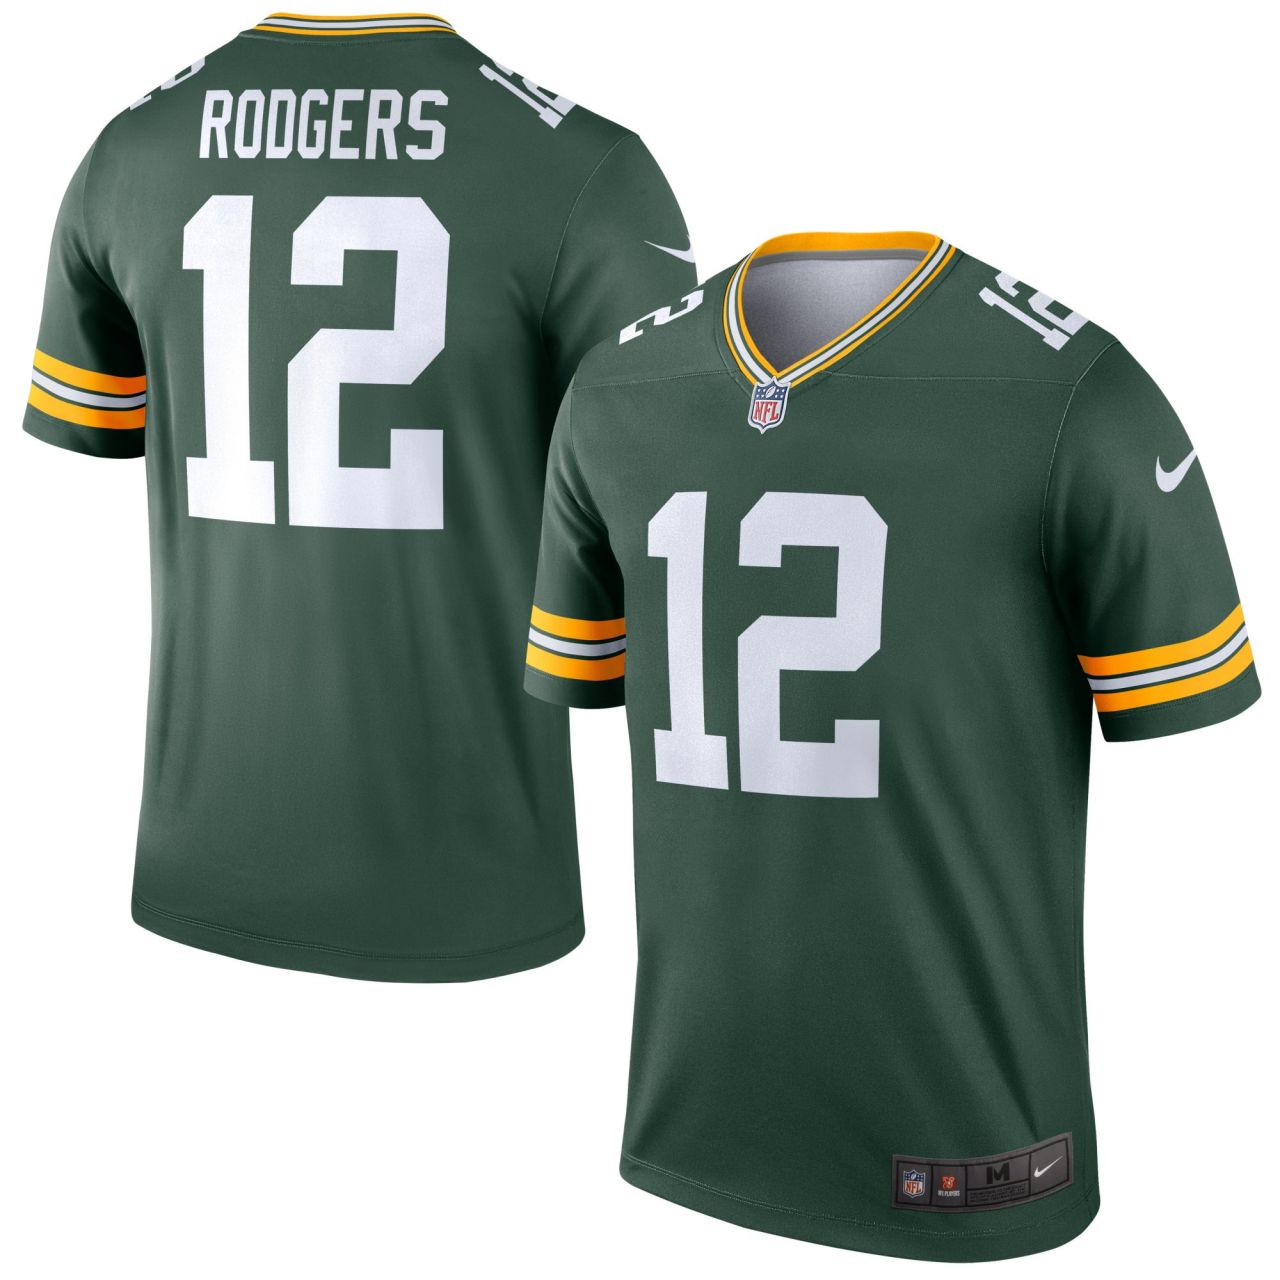 amfoo - Nike LEGEND Jersey Green Bay Packers #12 Aaron Rodgers